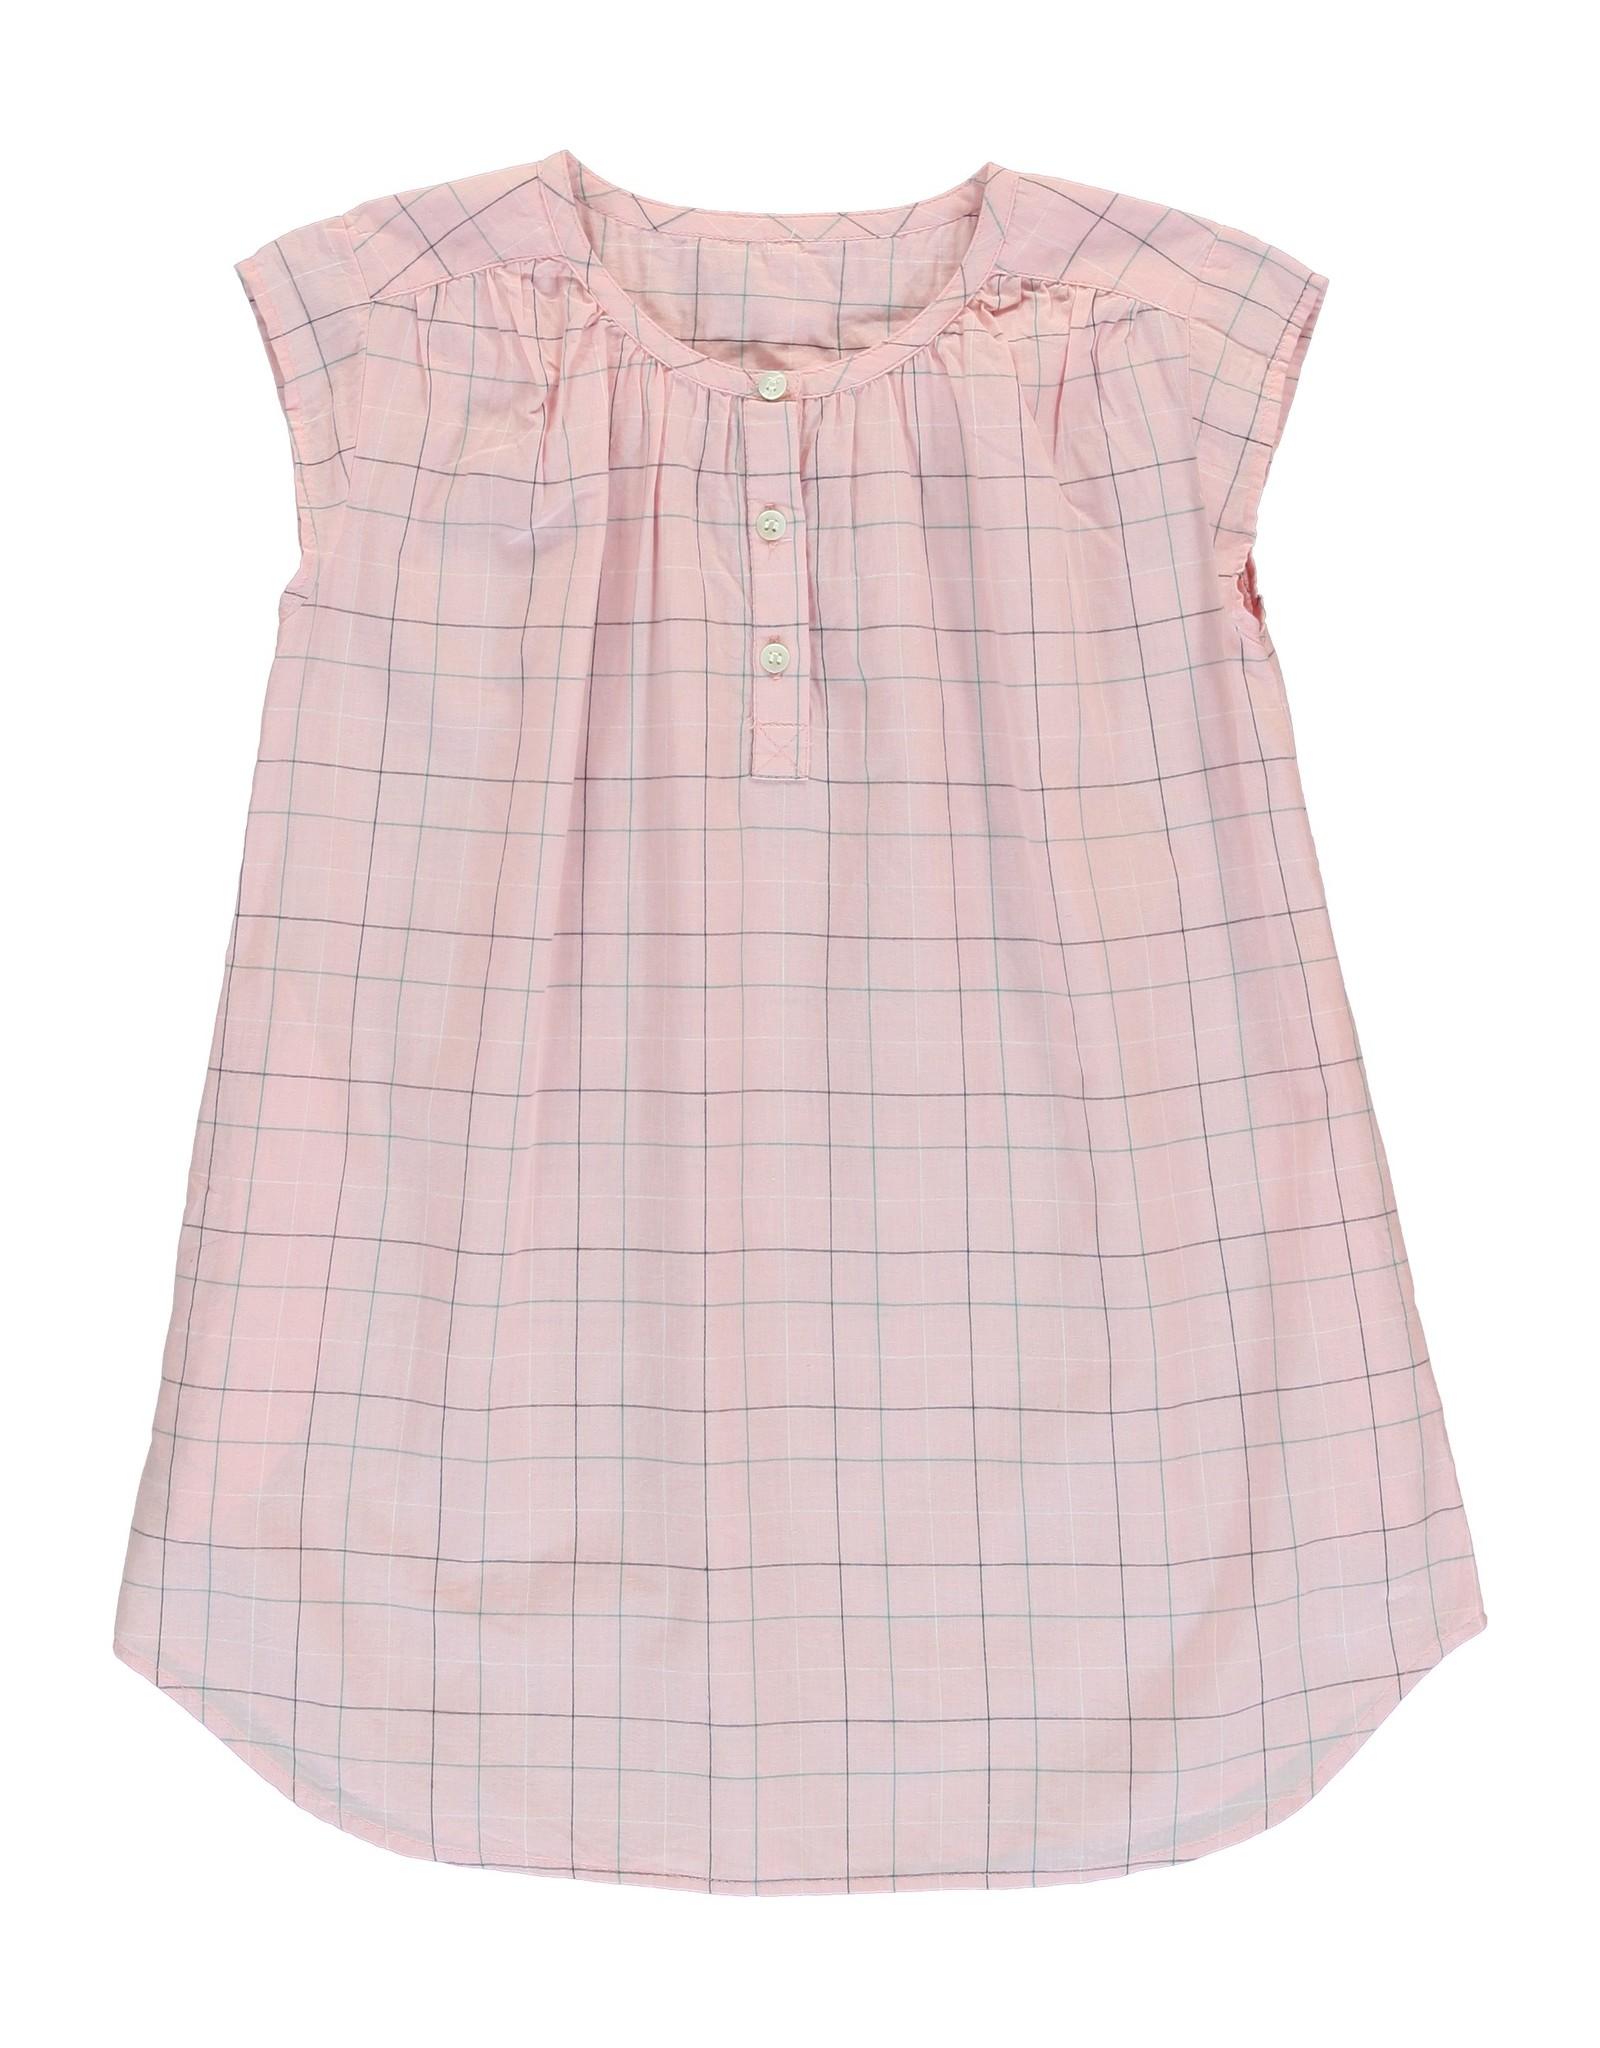 Dorélit Cyllene | Nightdress | Pink